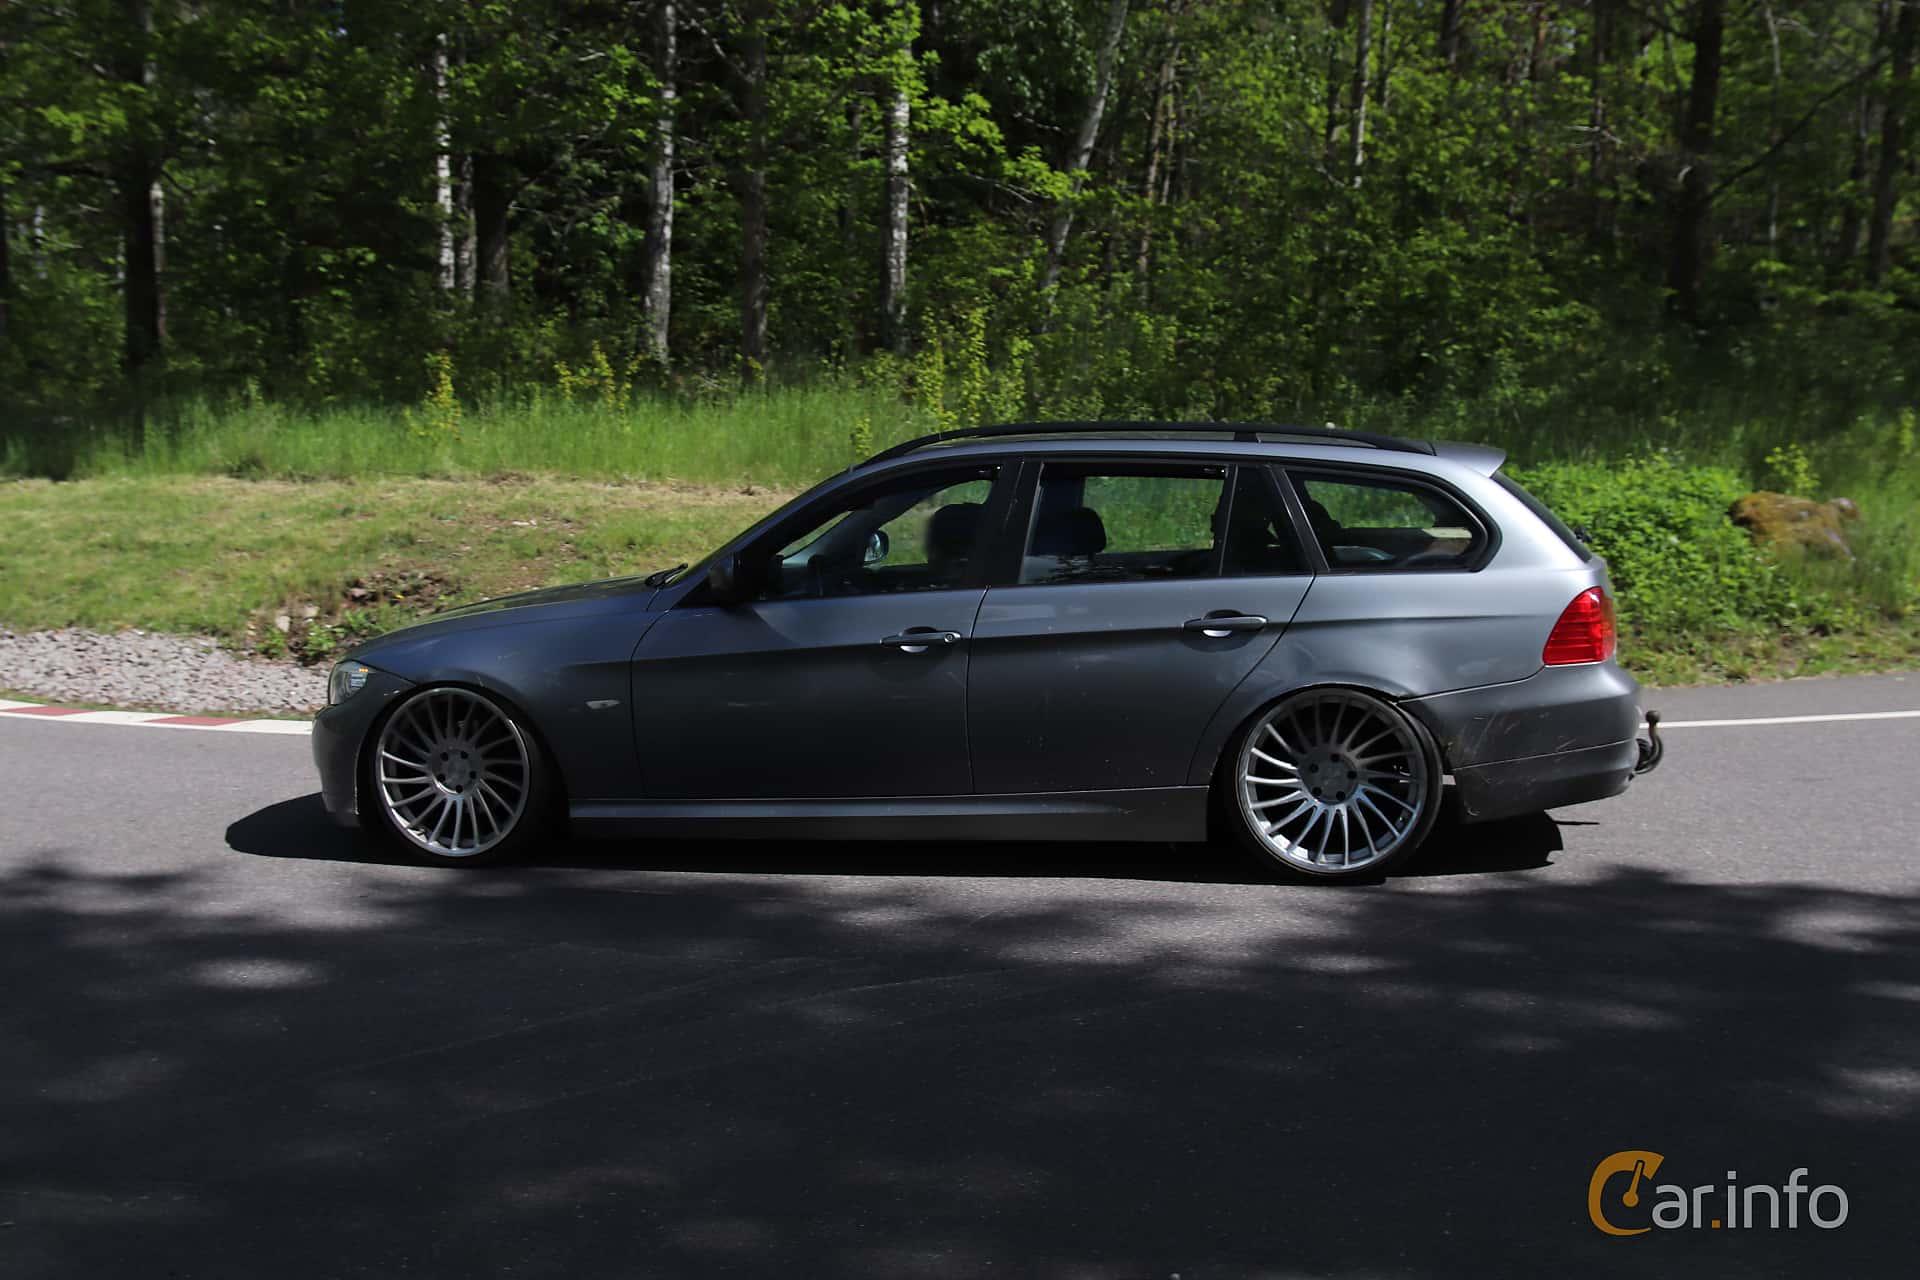 BMW 320d generation E90 LCI, Manual, 6-speed